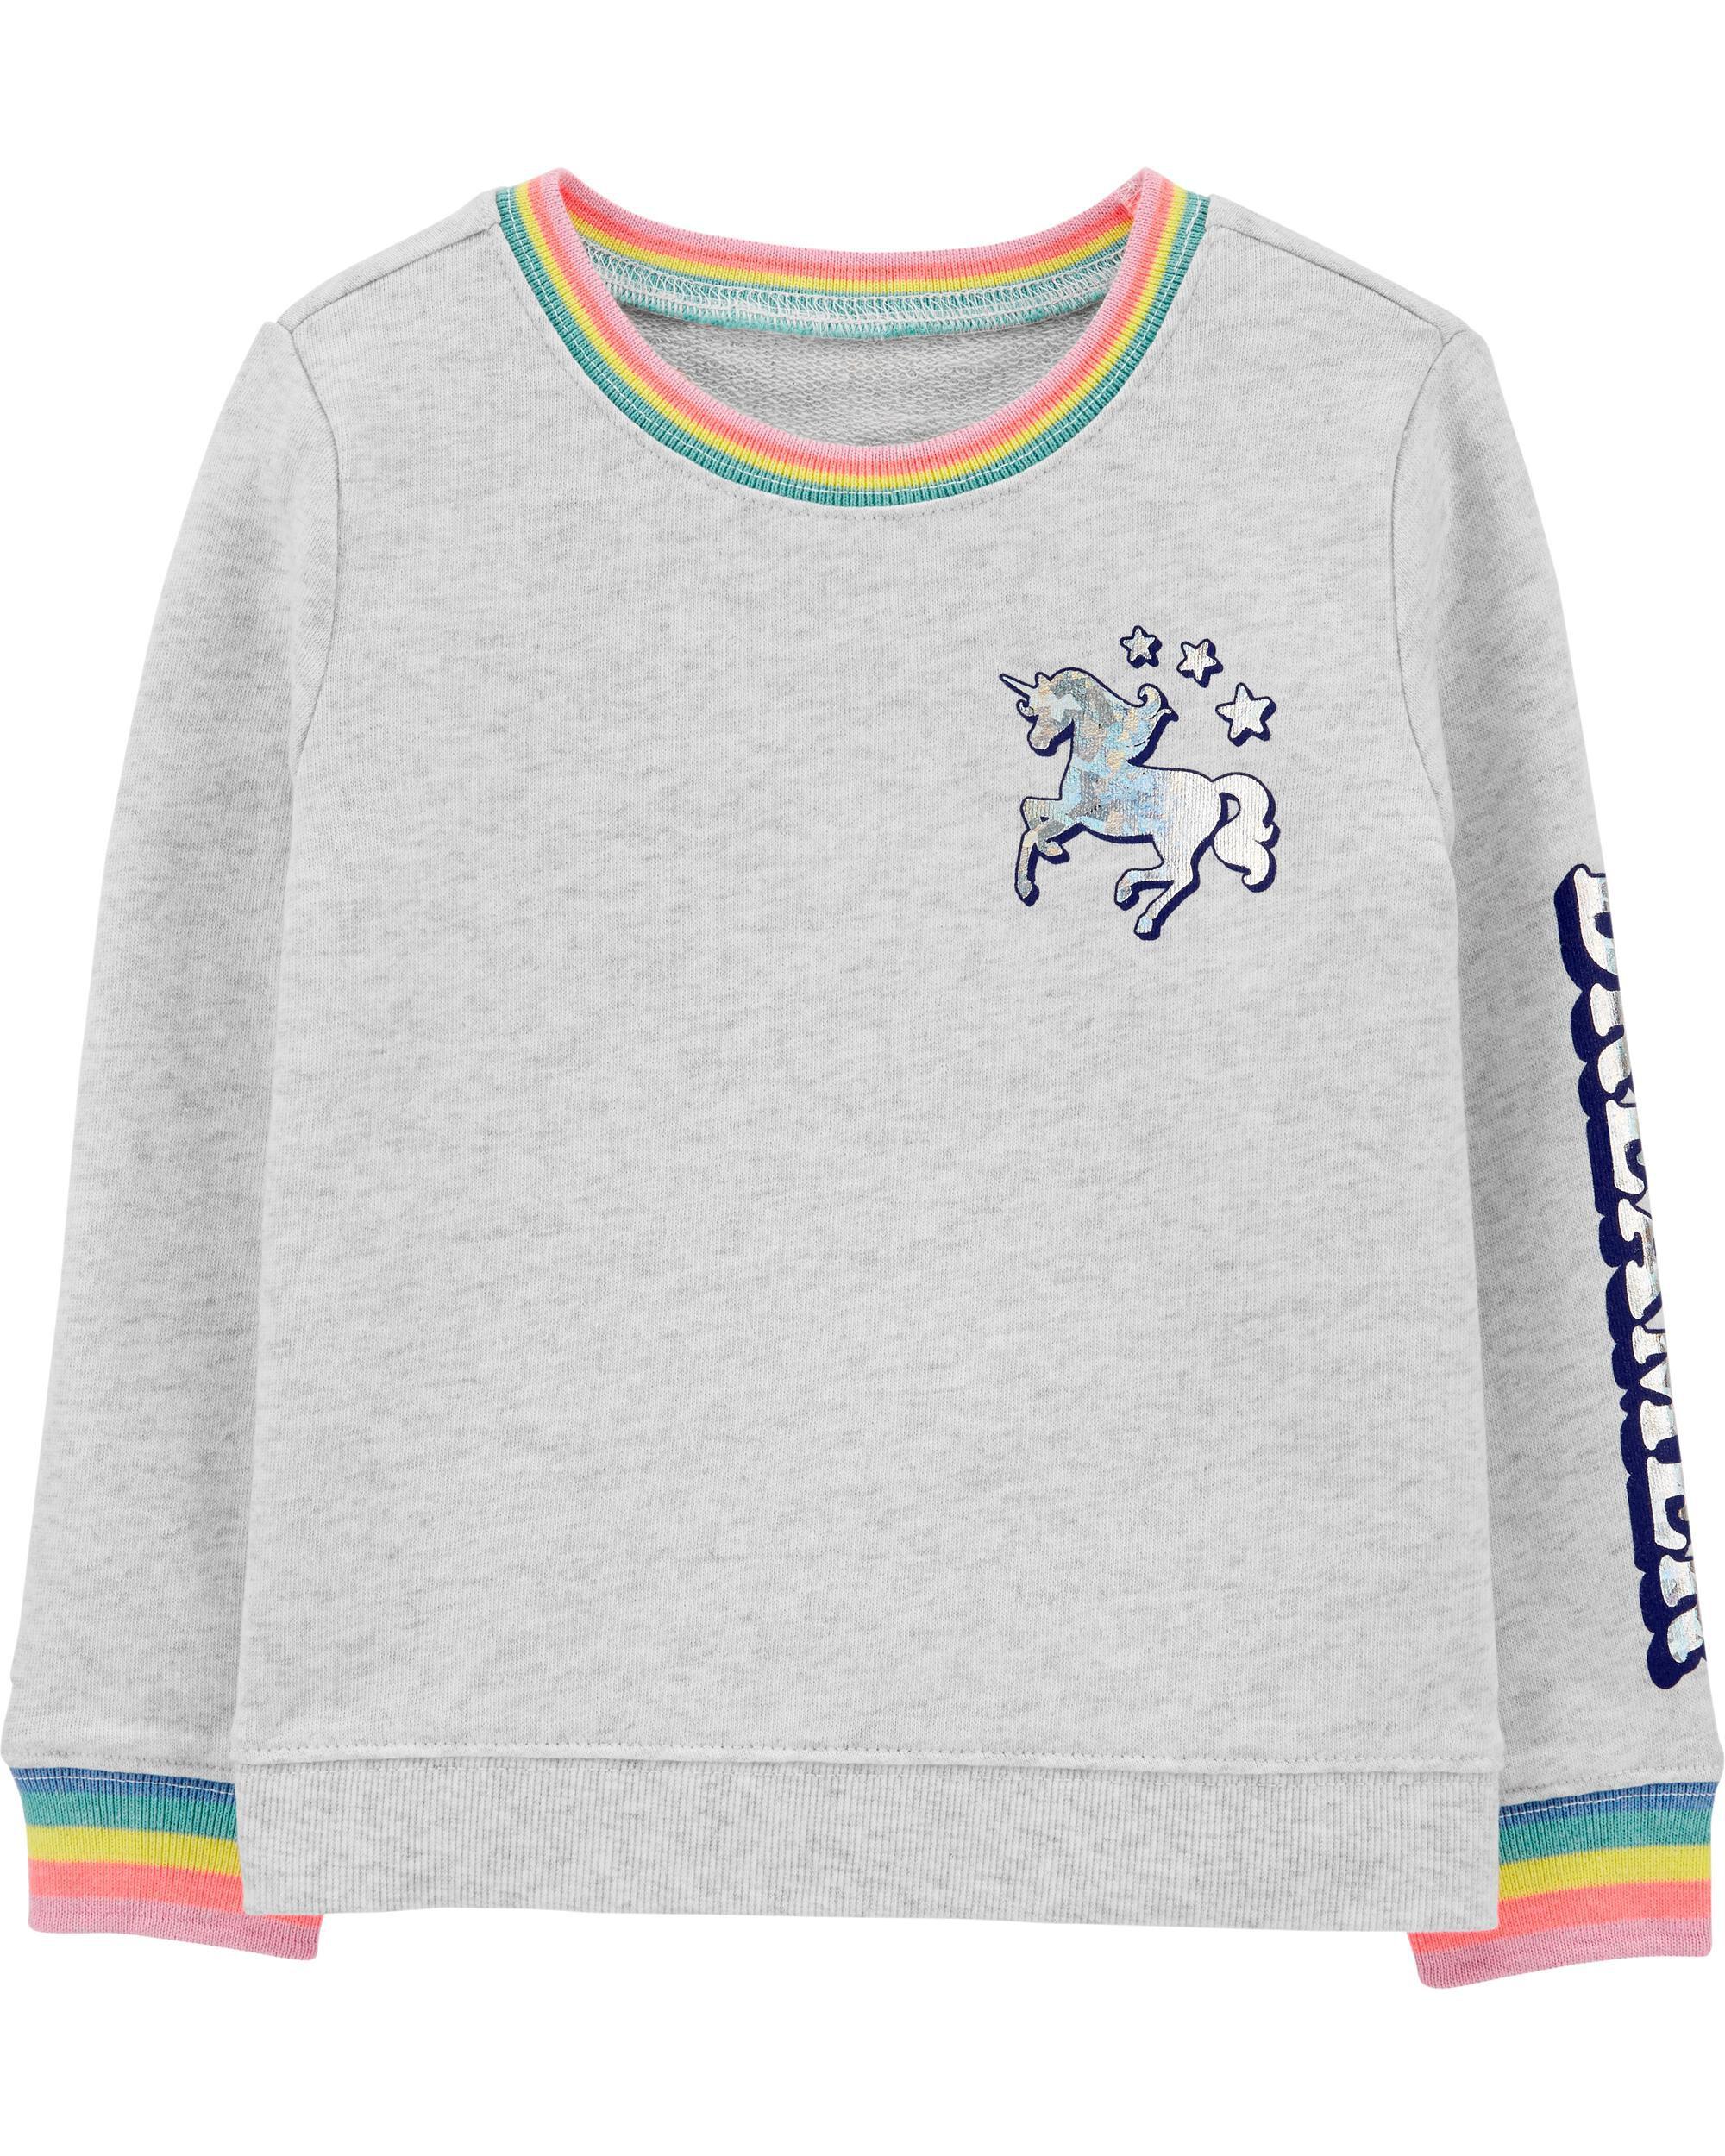 *Clearance*  Rainbow Unicorn Sweatshirt